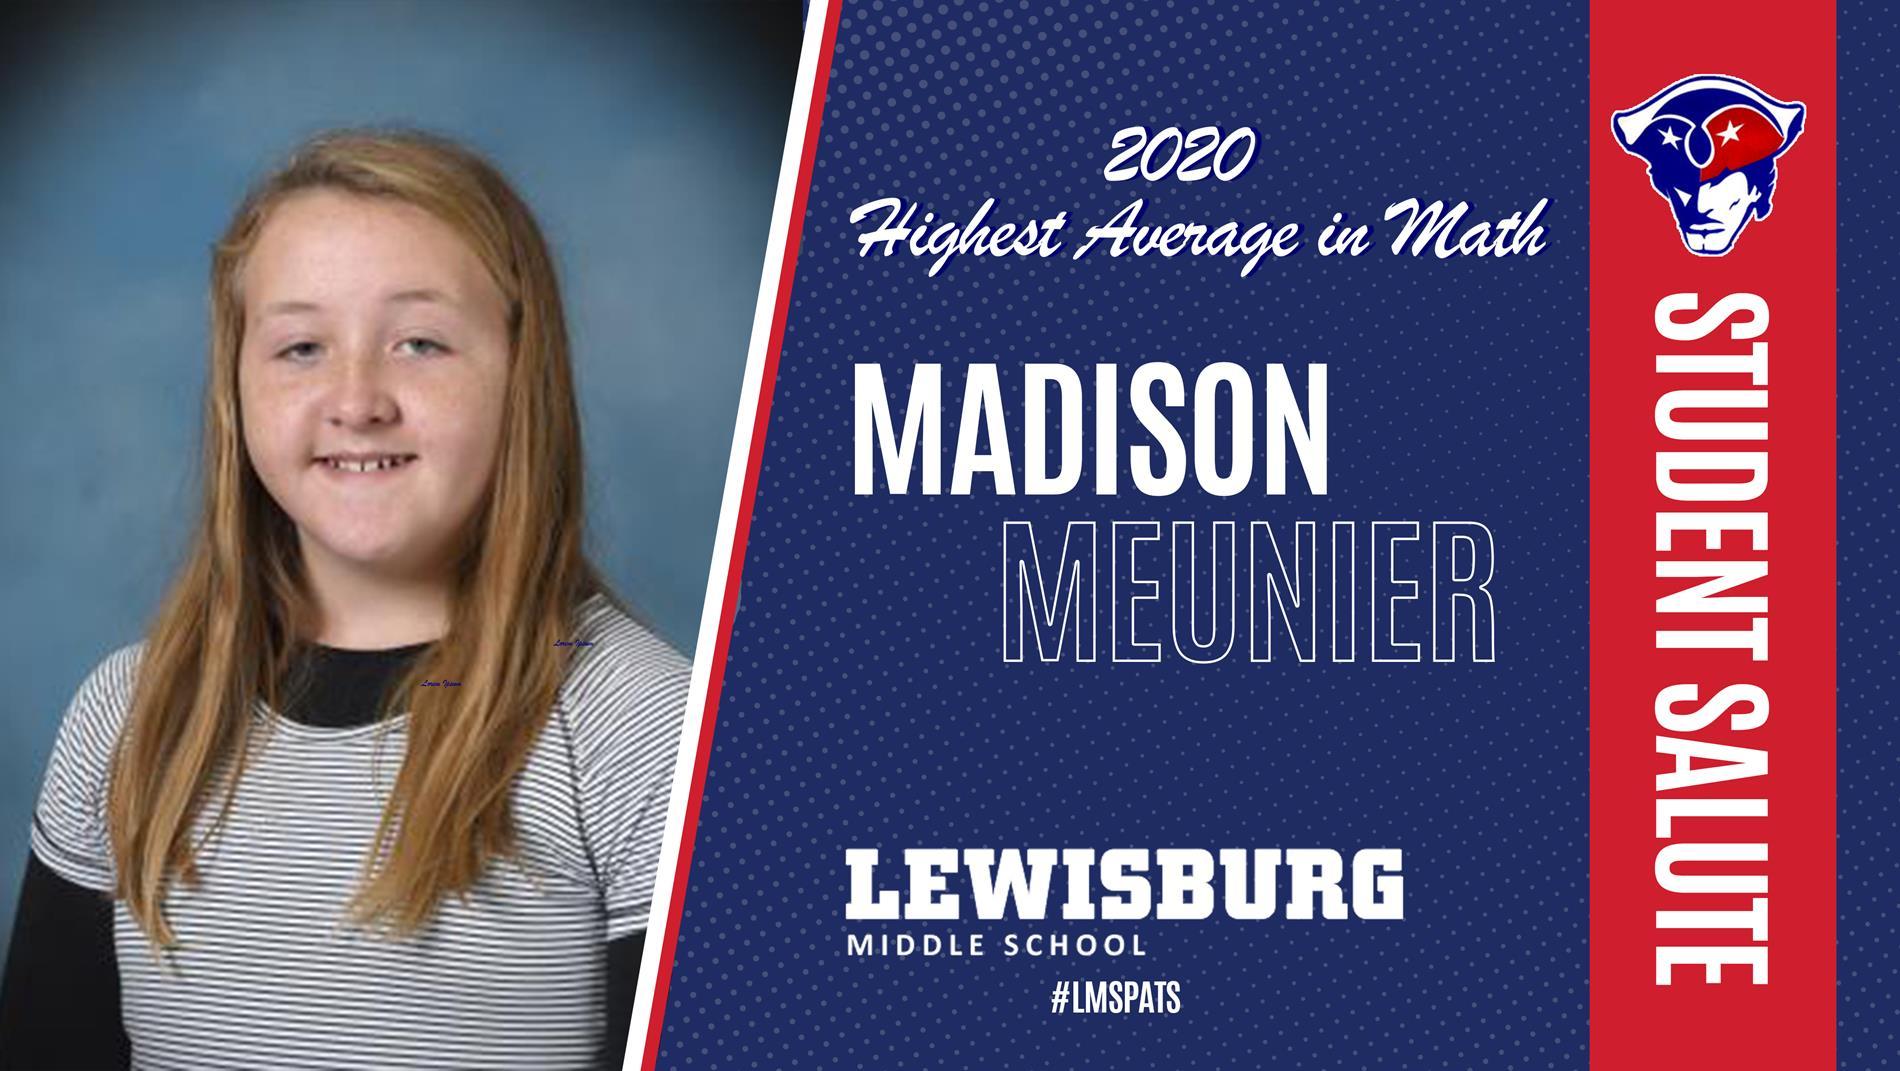 Congrats Madison!